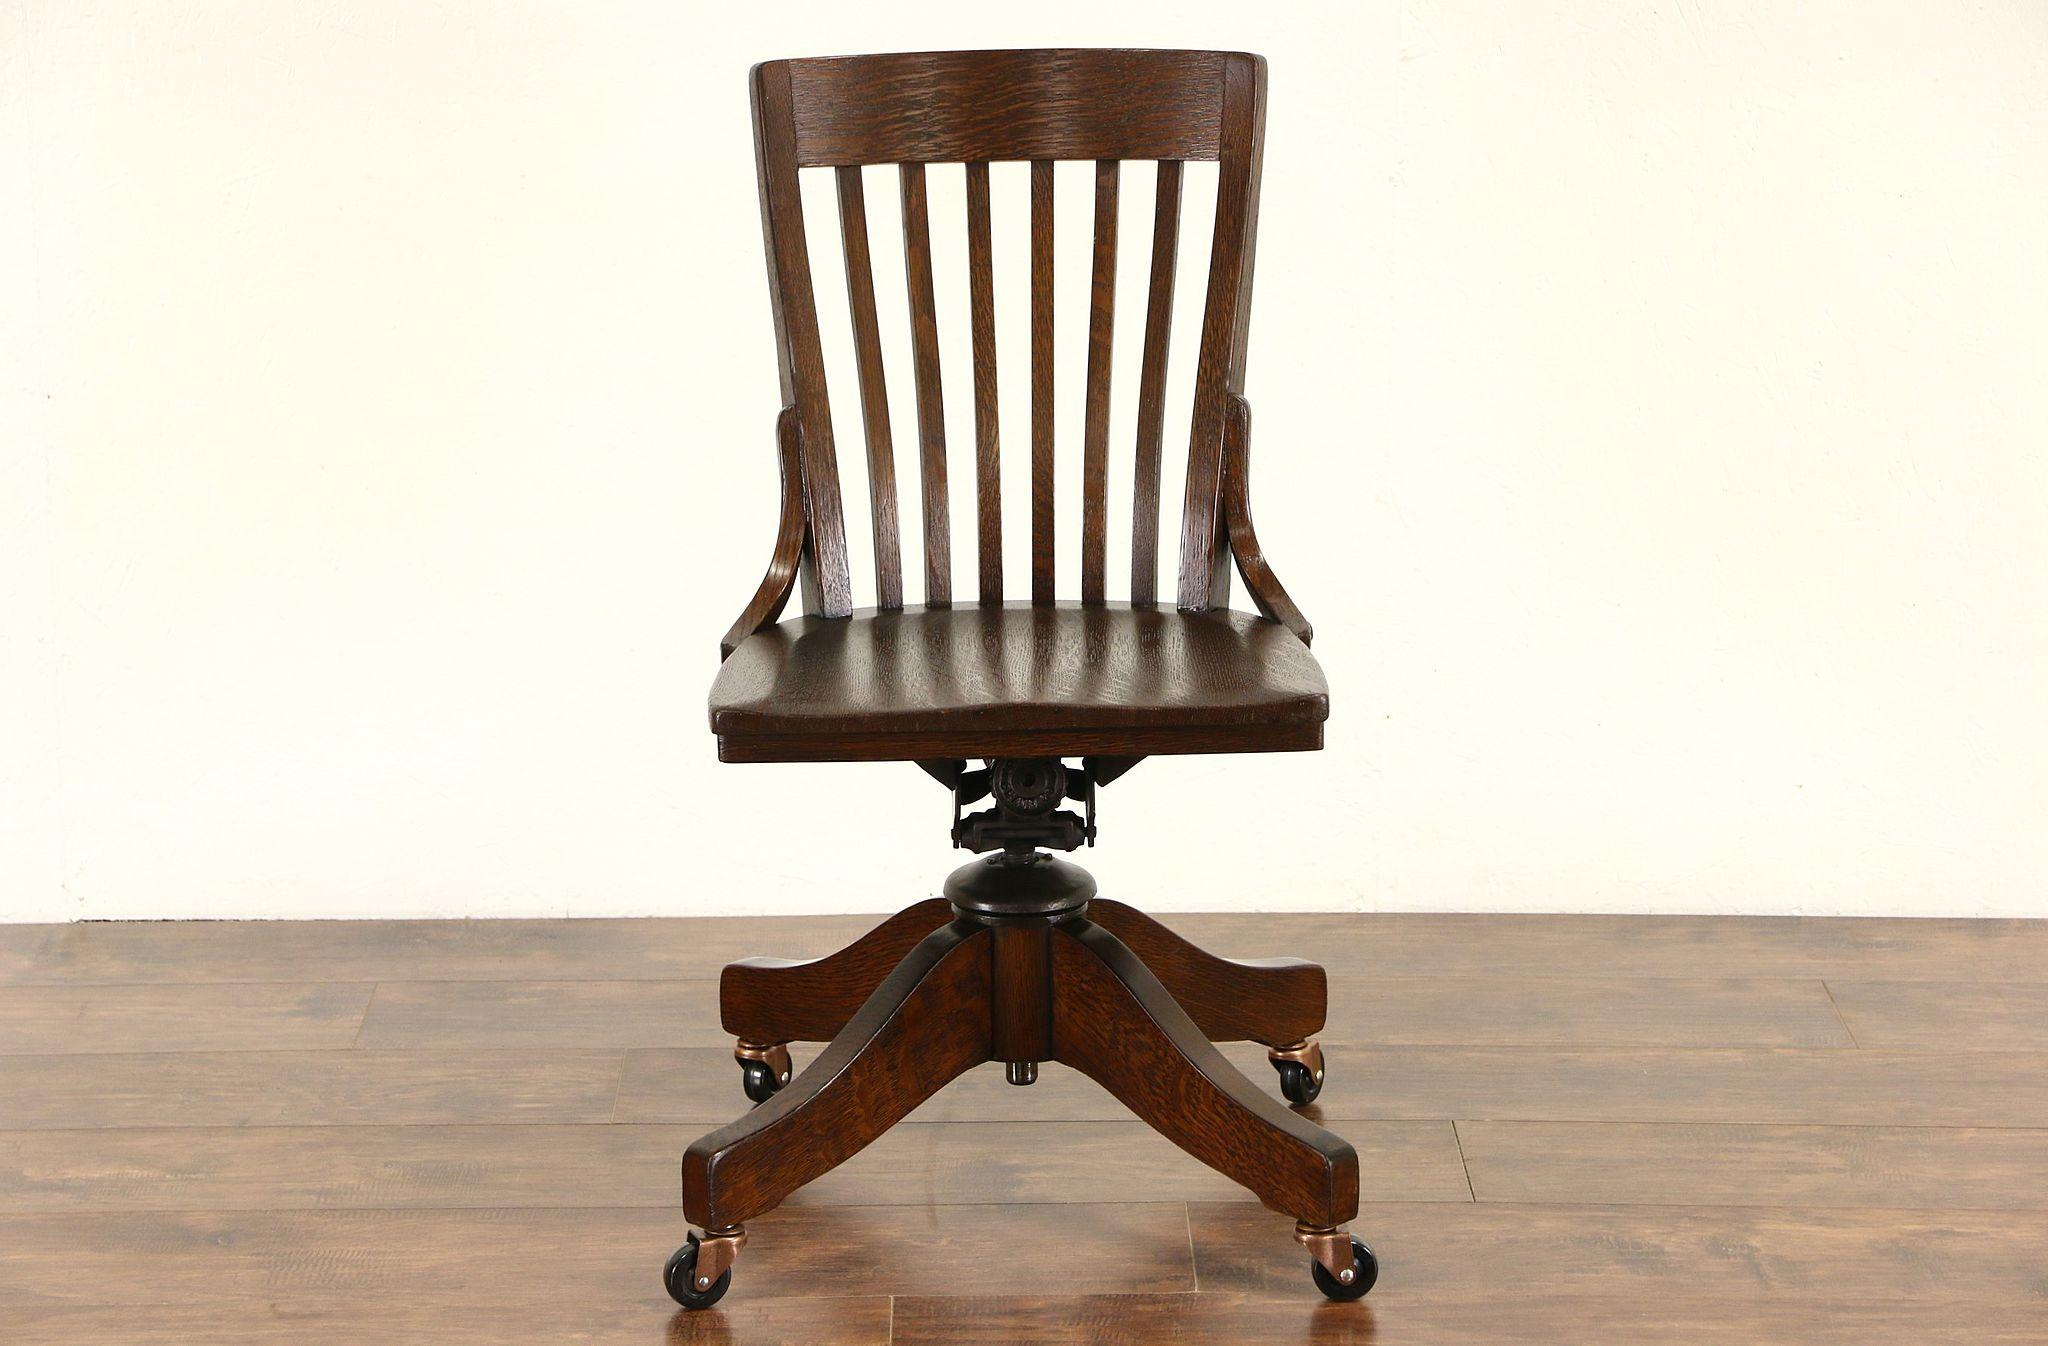 SOLD Oak Antique 1910 Adjustable Swivel fice or Library Desk